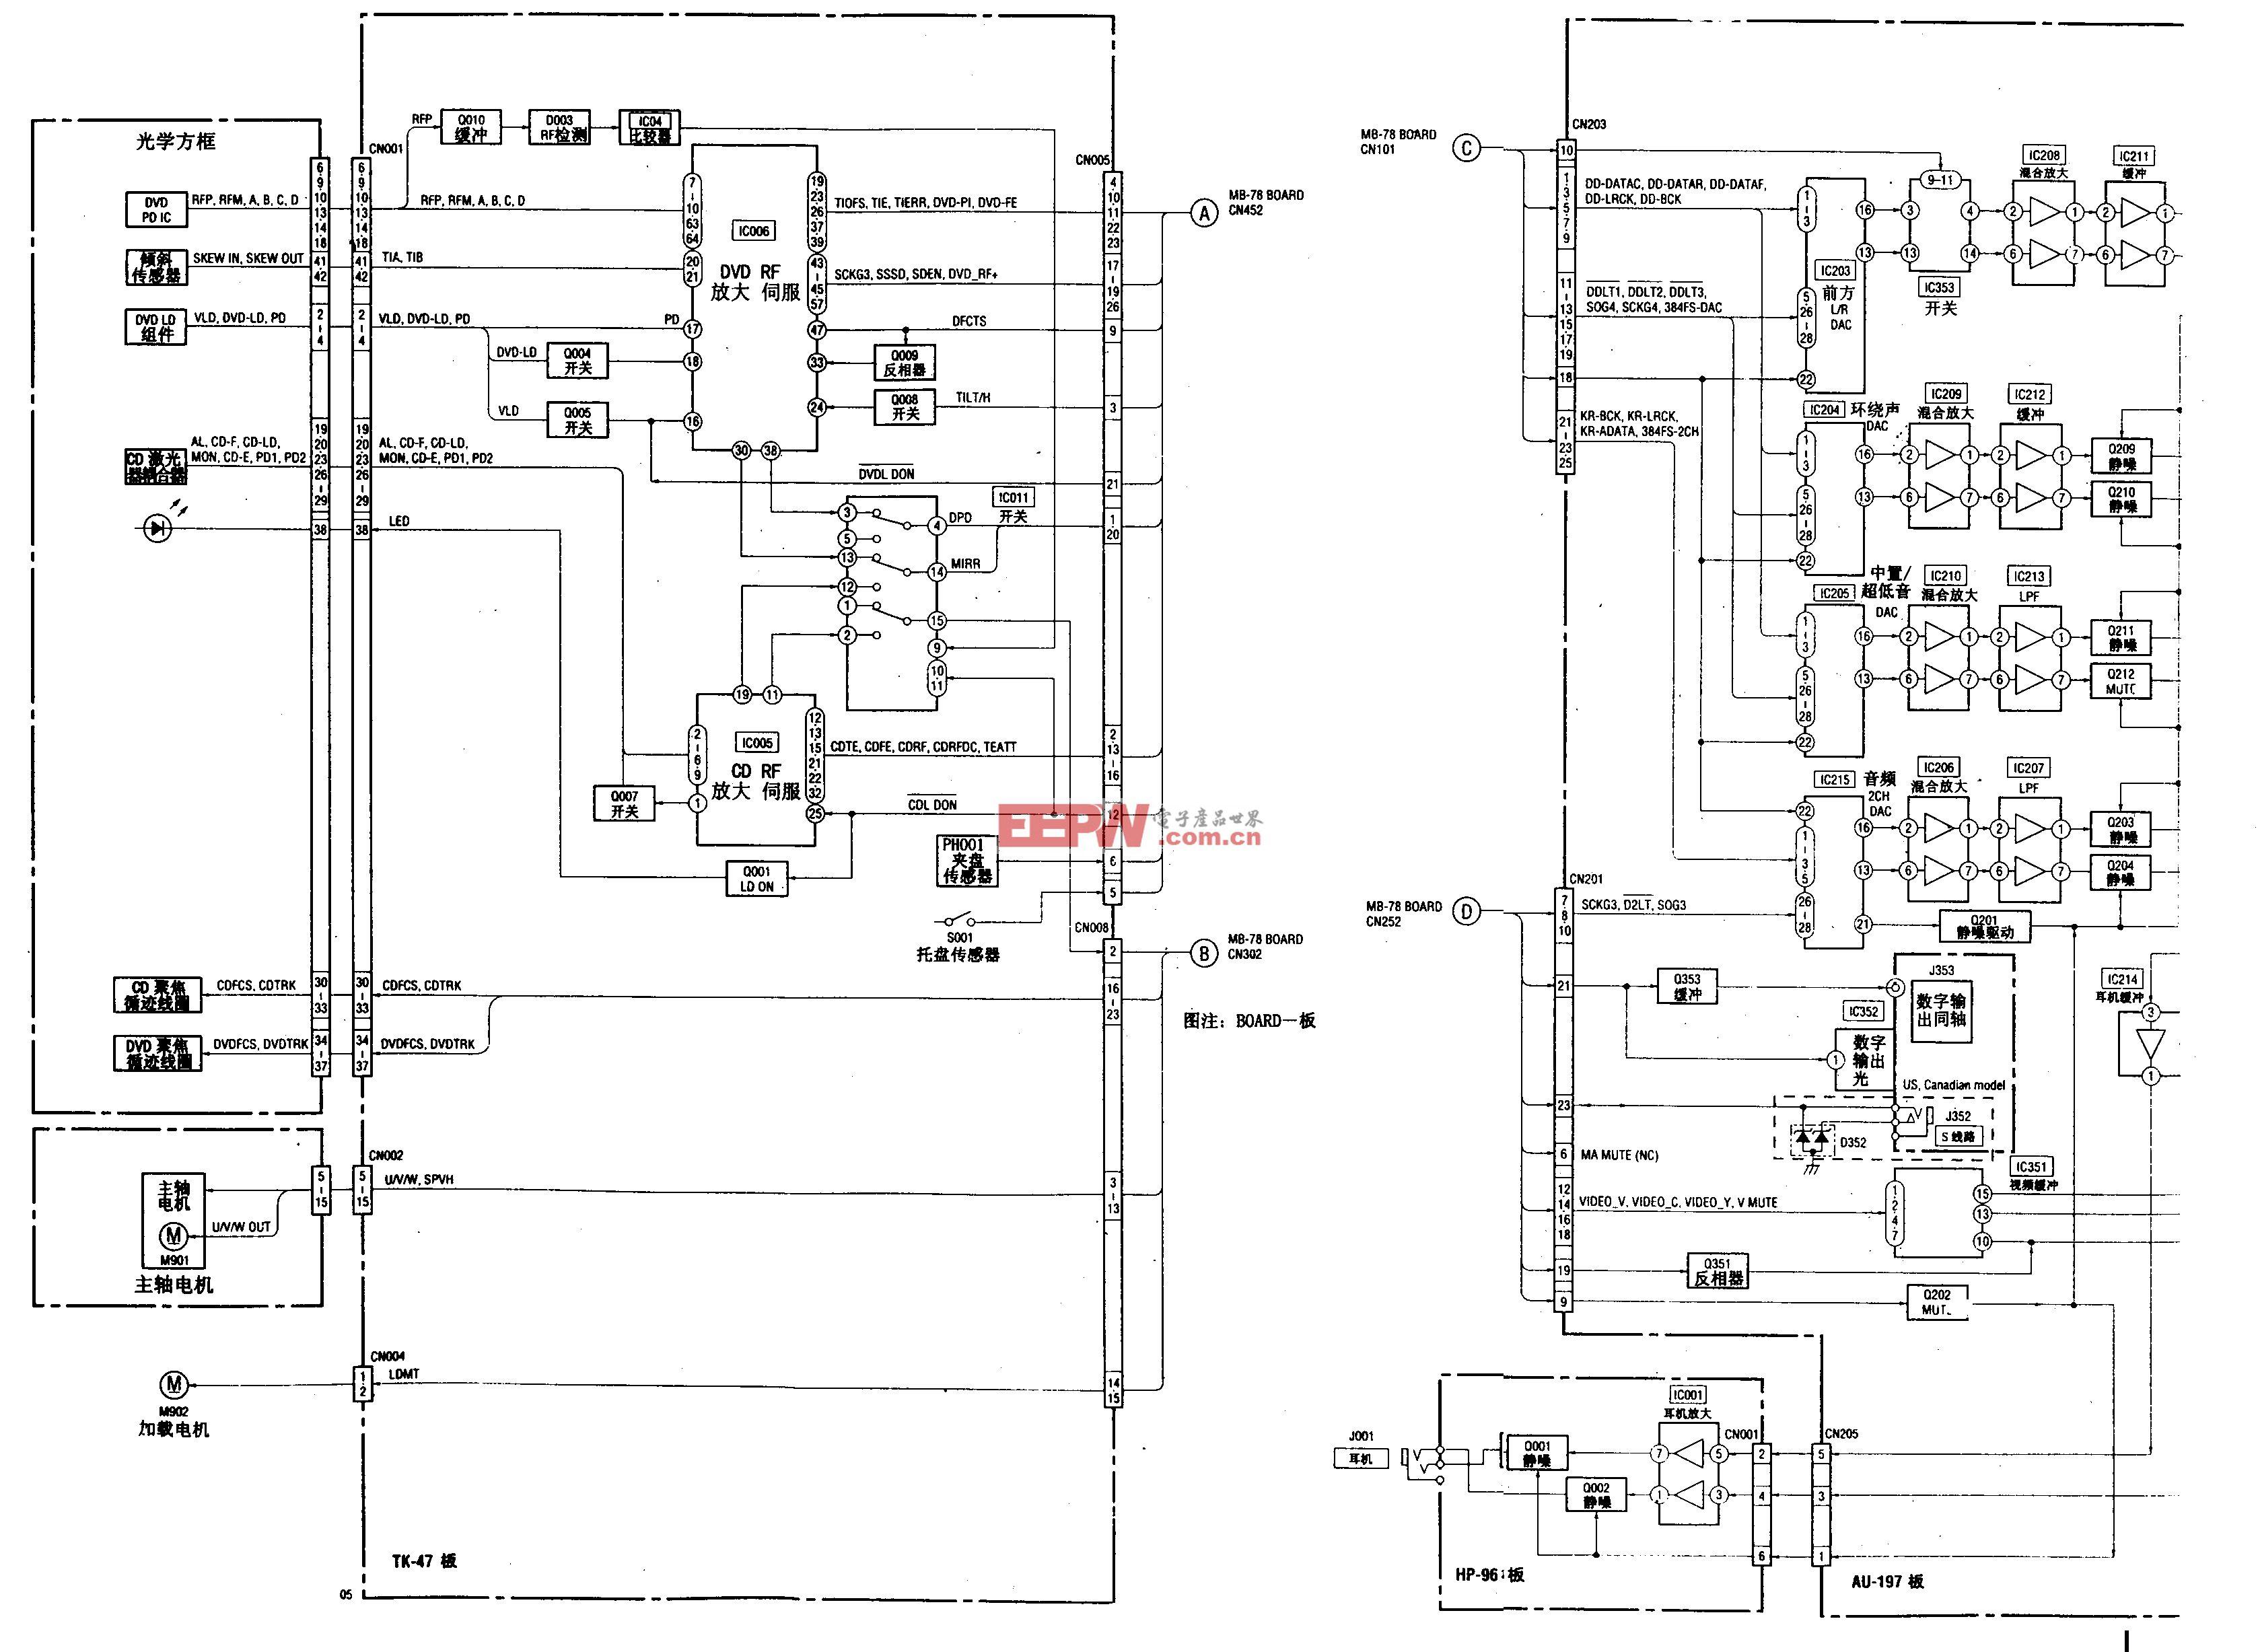 SONY DVP-S500D/S505D型DVD-RF,伺服,电源电路图B